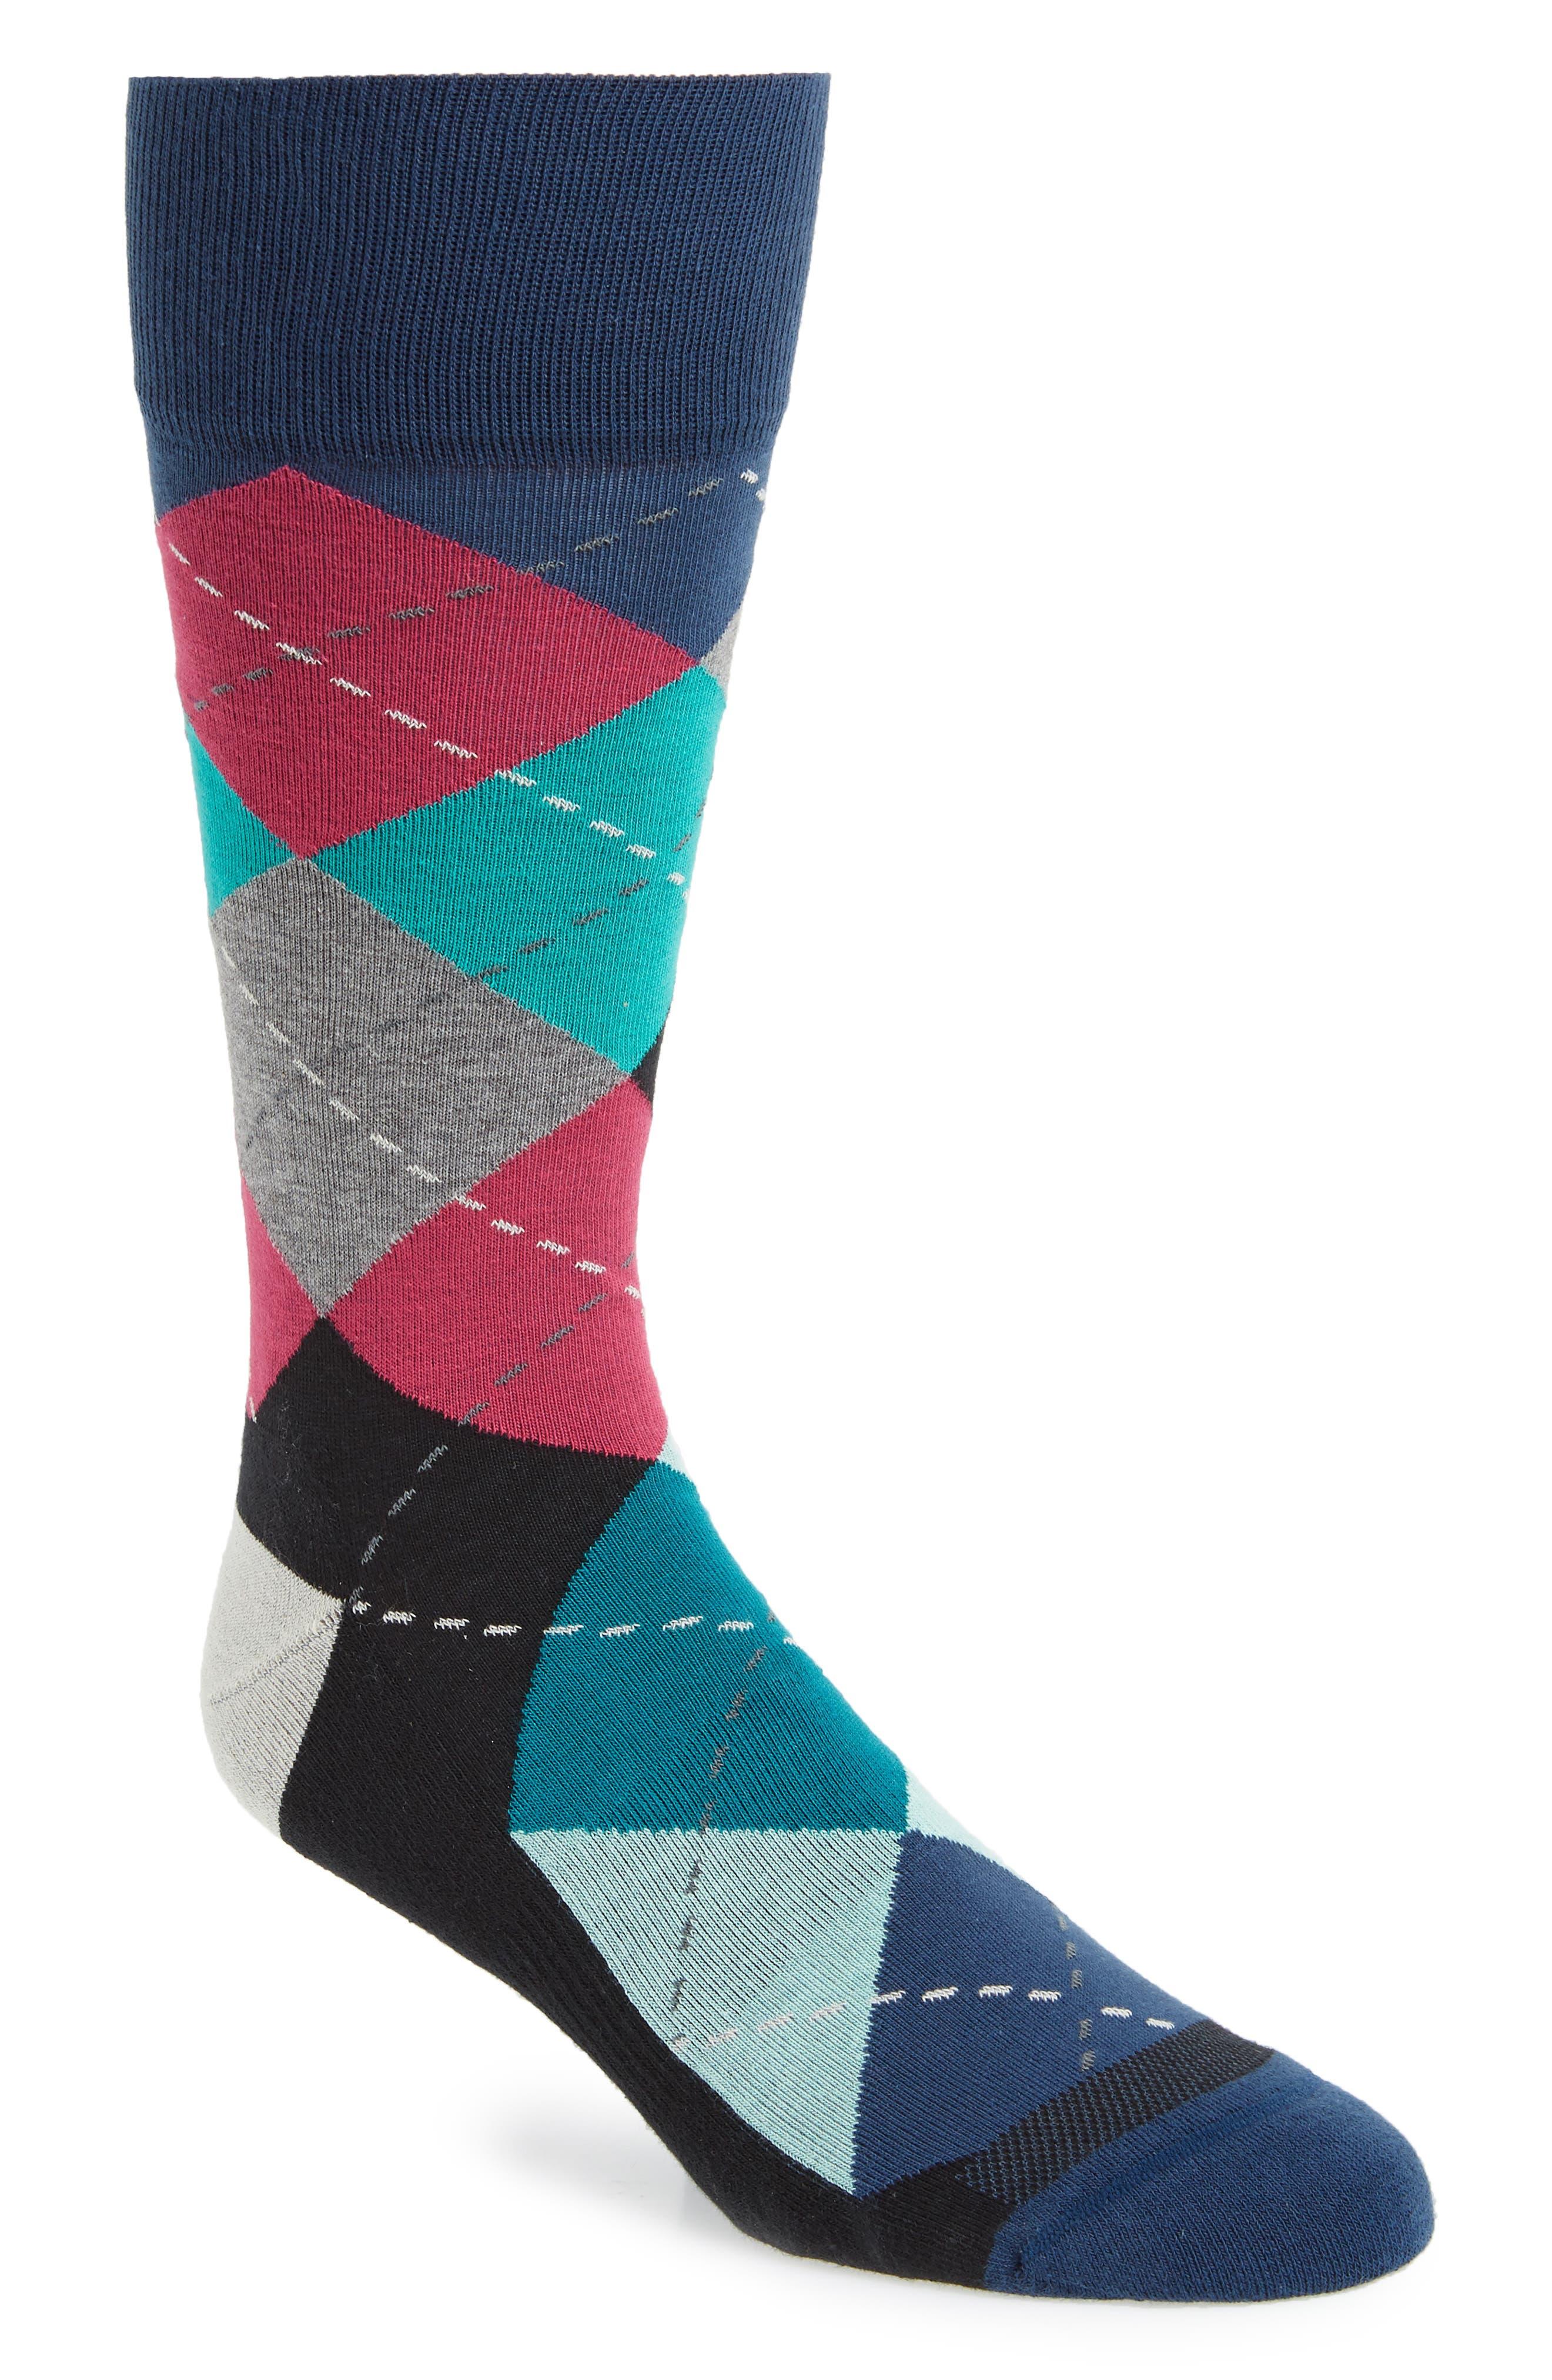 Argyle Socks,                             Main thumbnail 1, color,                             Navy/ Red